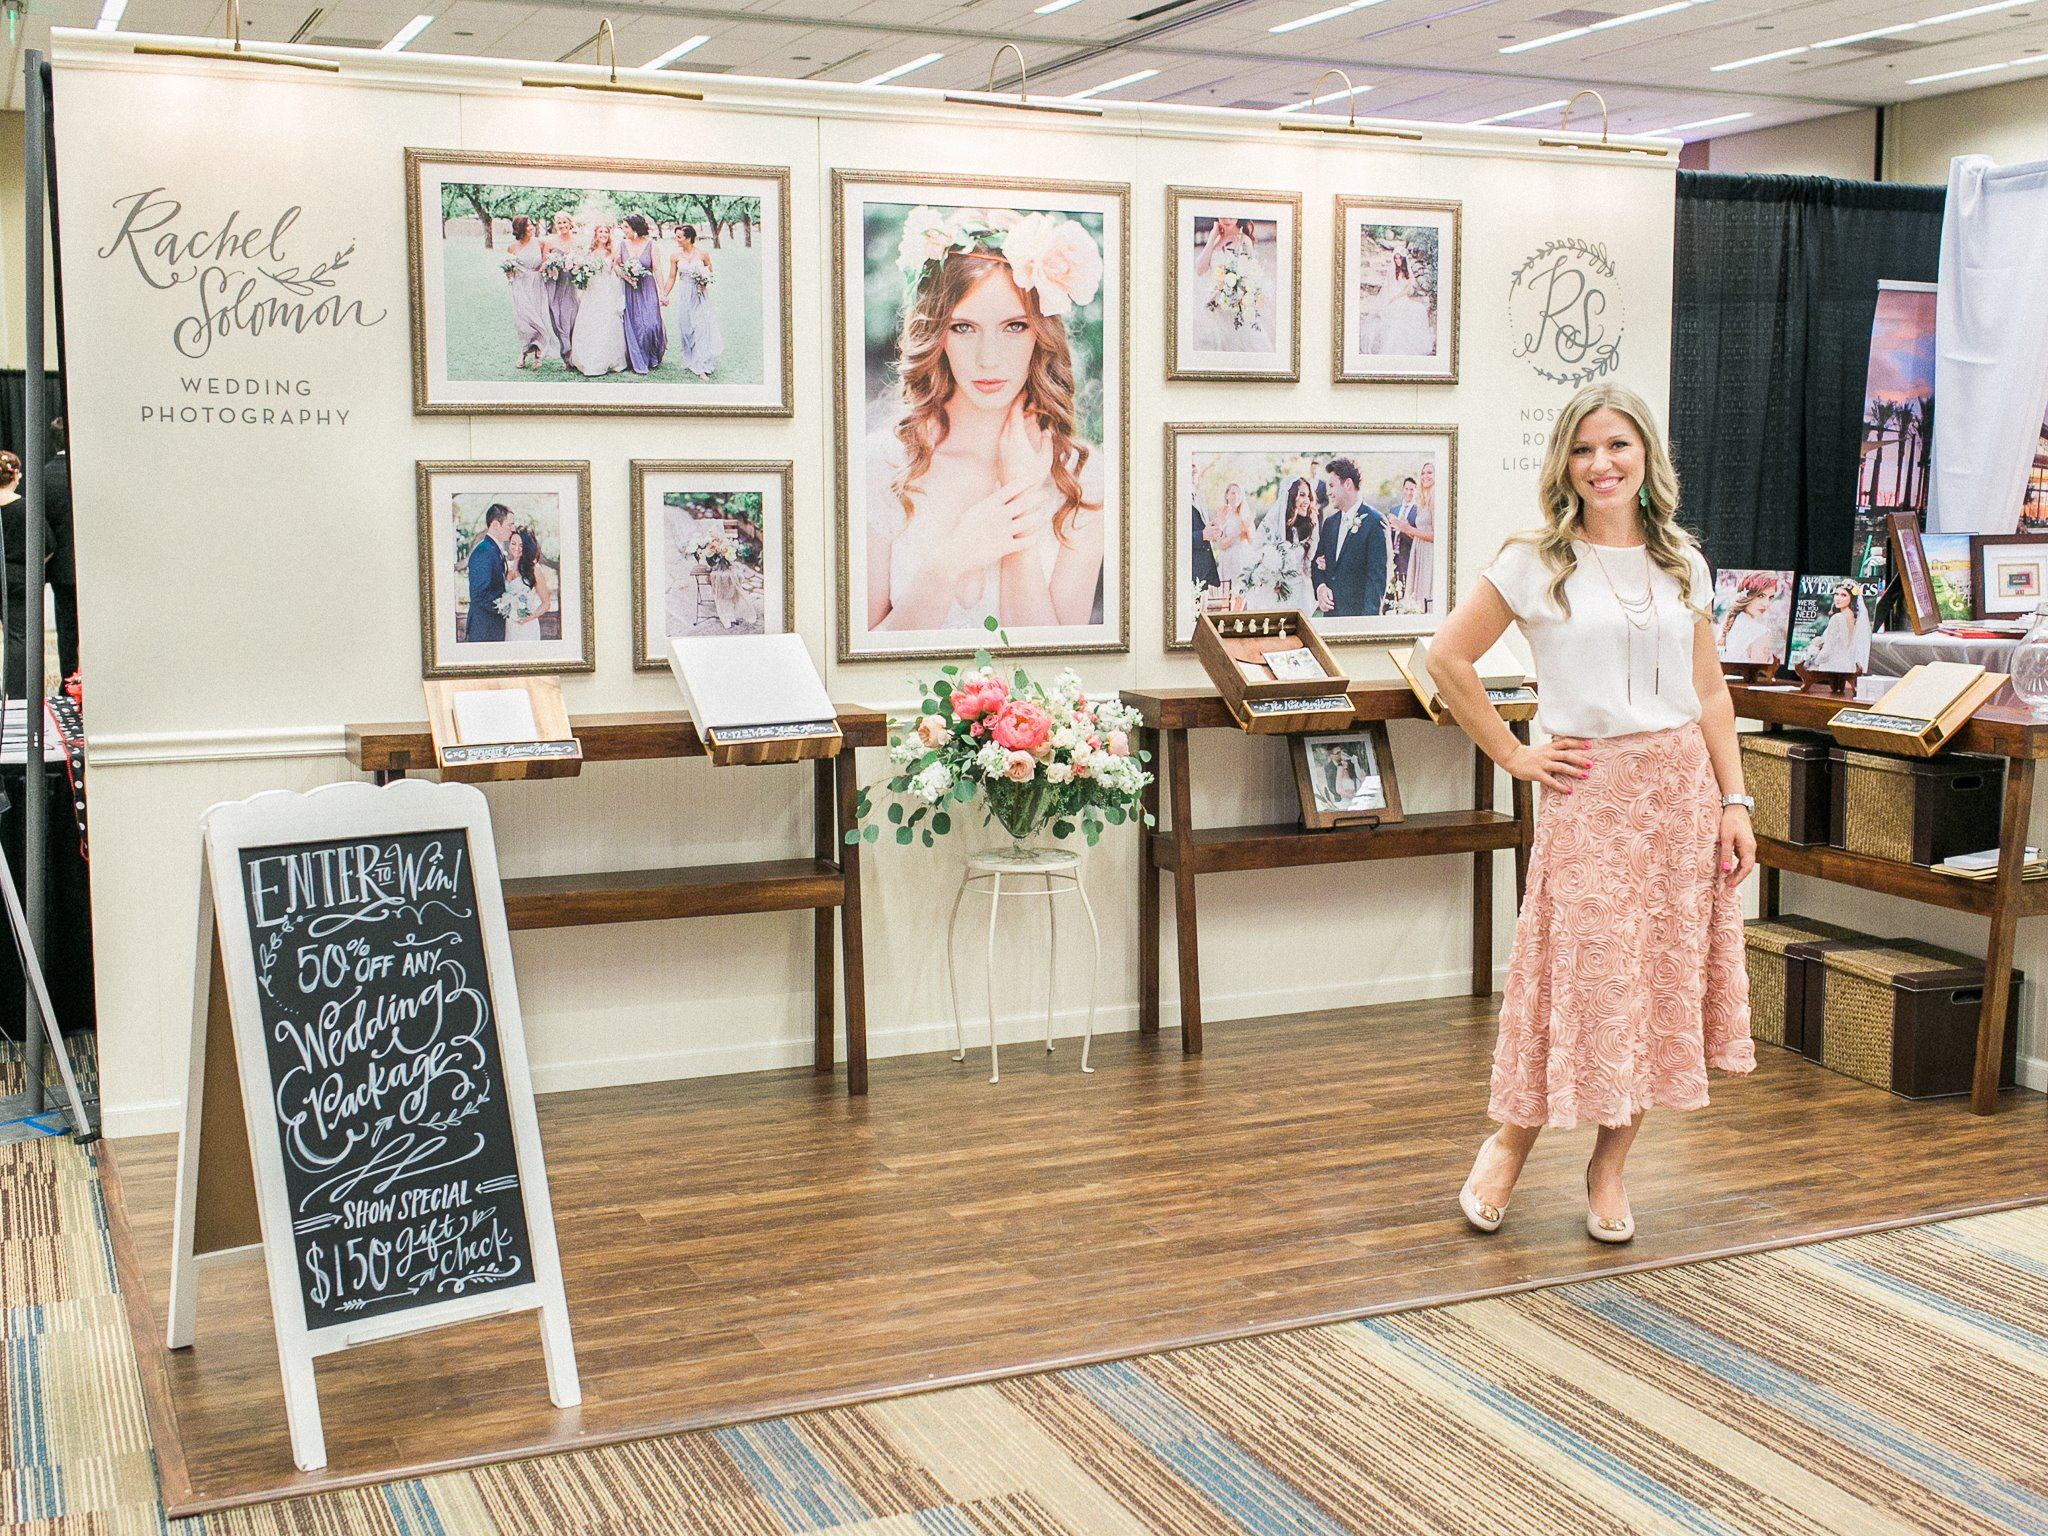 Wedding Fair Booth By Rachel Solomon Wedding Show Booth Wedding Expo Booth Photography Booth